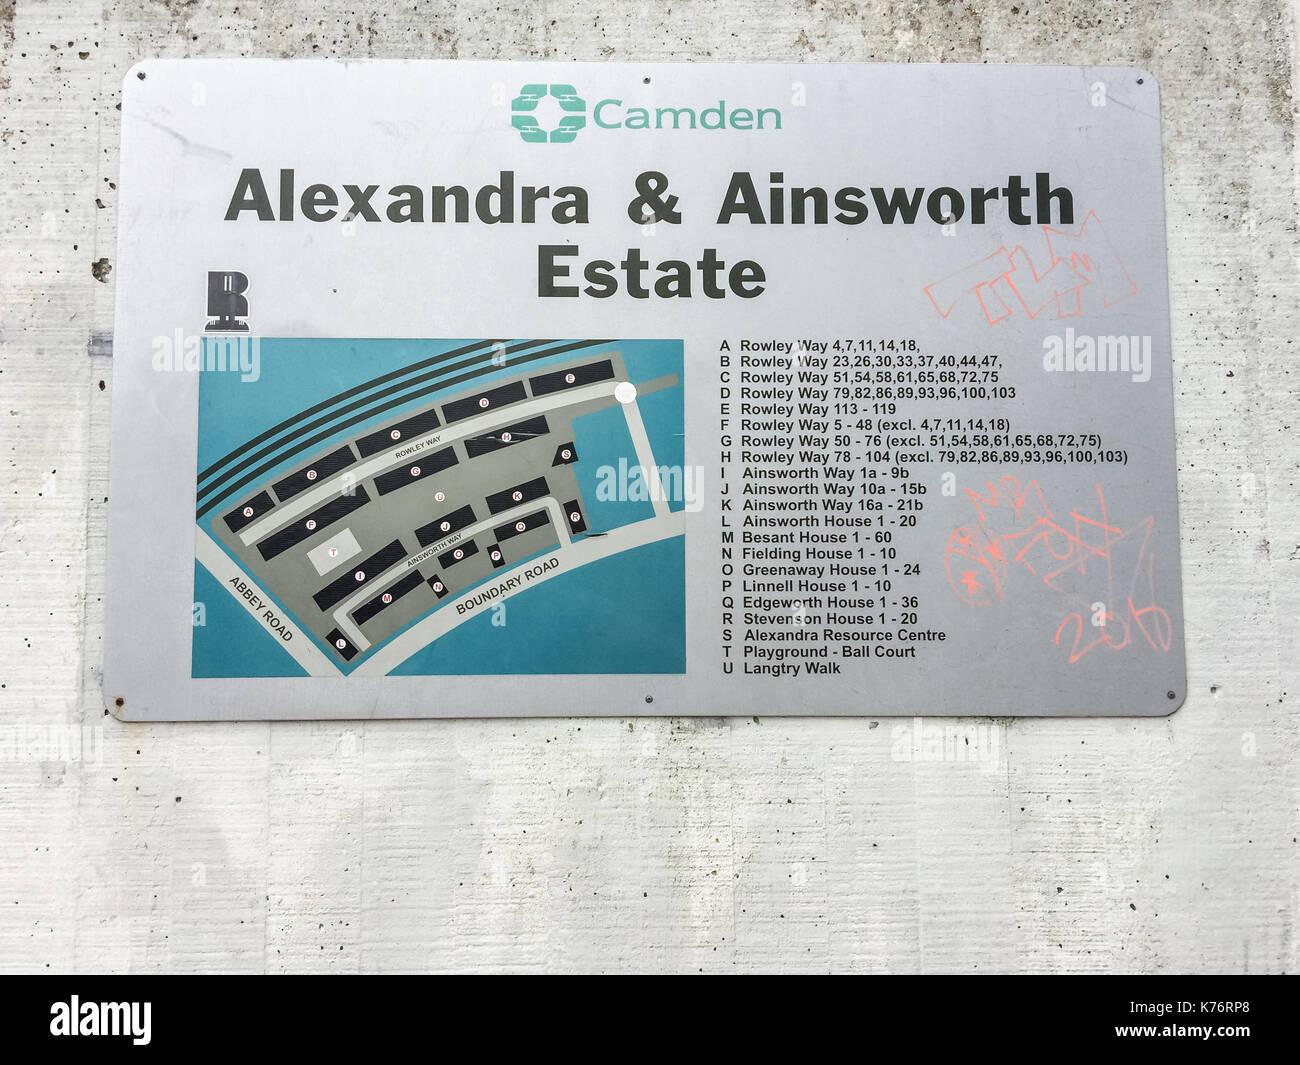 Alexandra & Ainsworth Estate, London Stock Photo